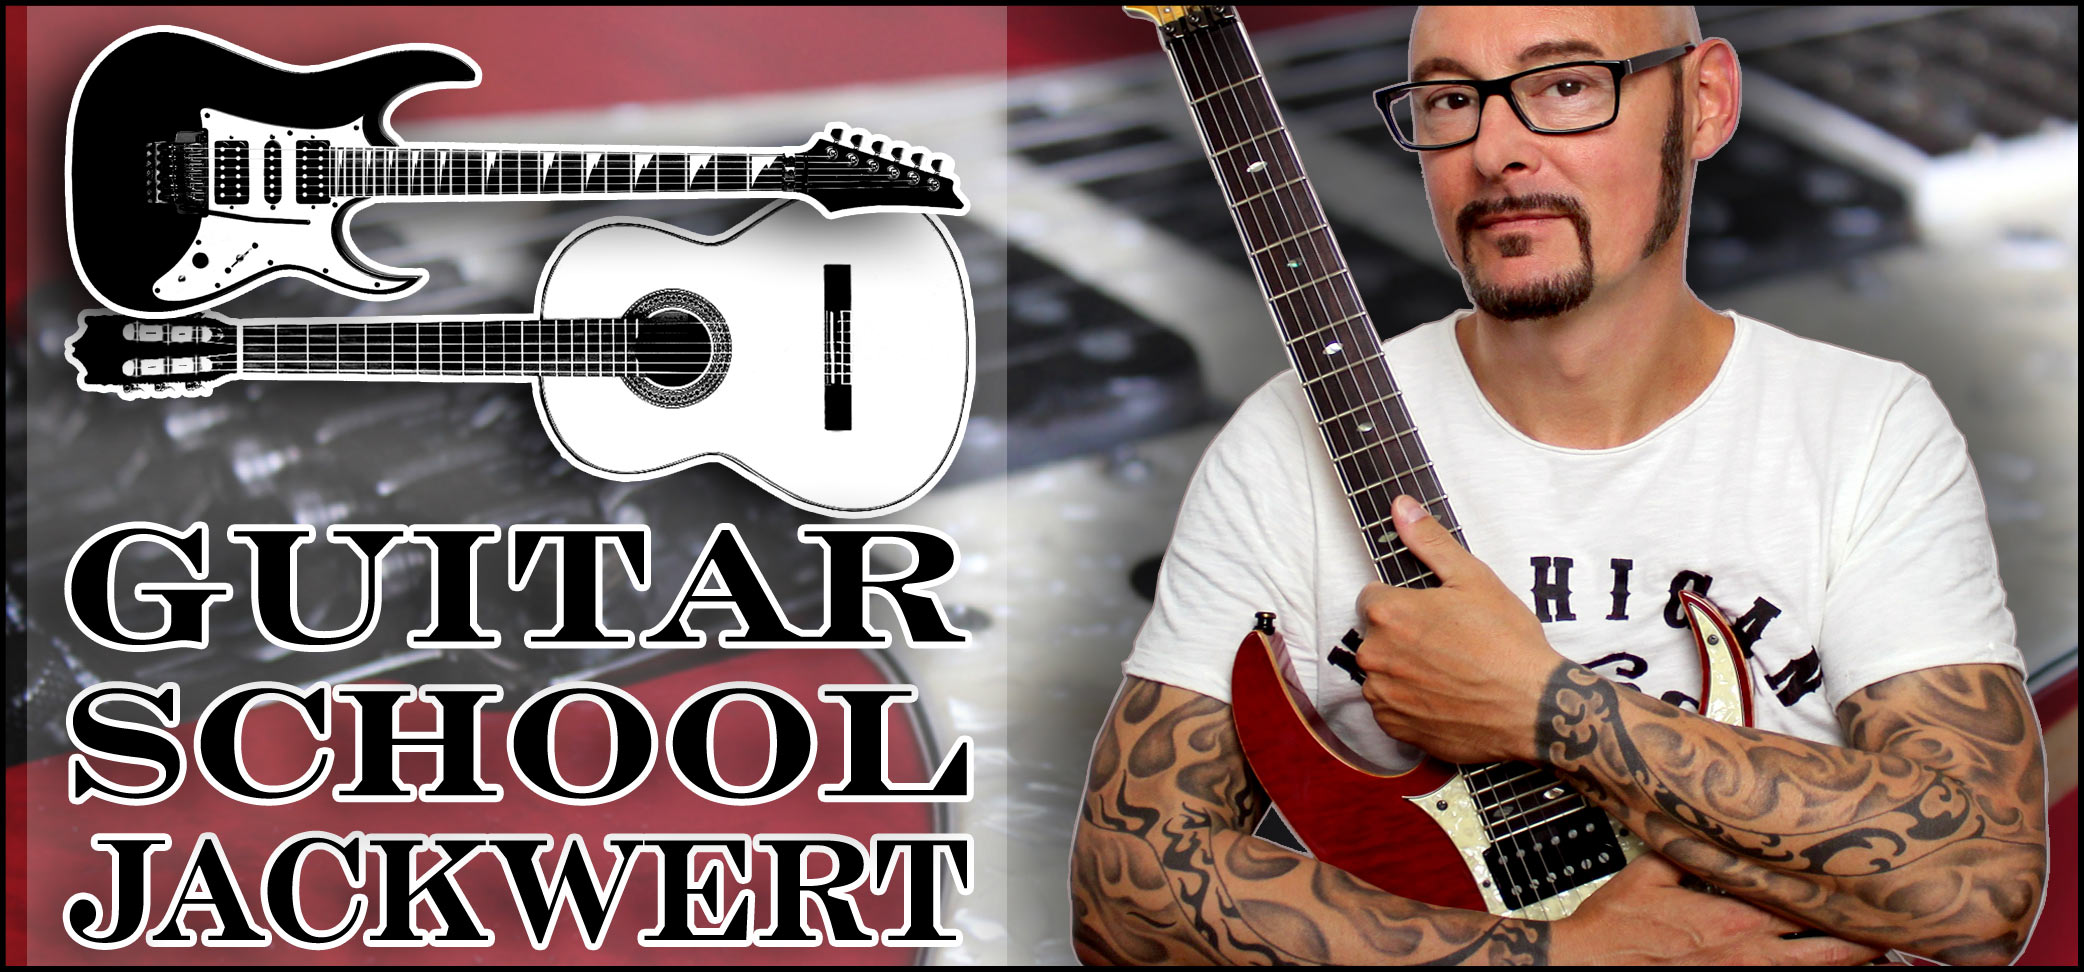 Gitarrist und Gitarrenlehrer Olaf Jackwert